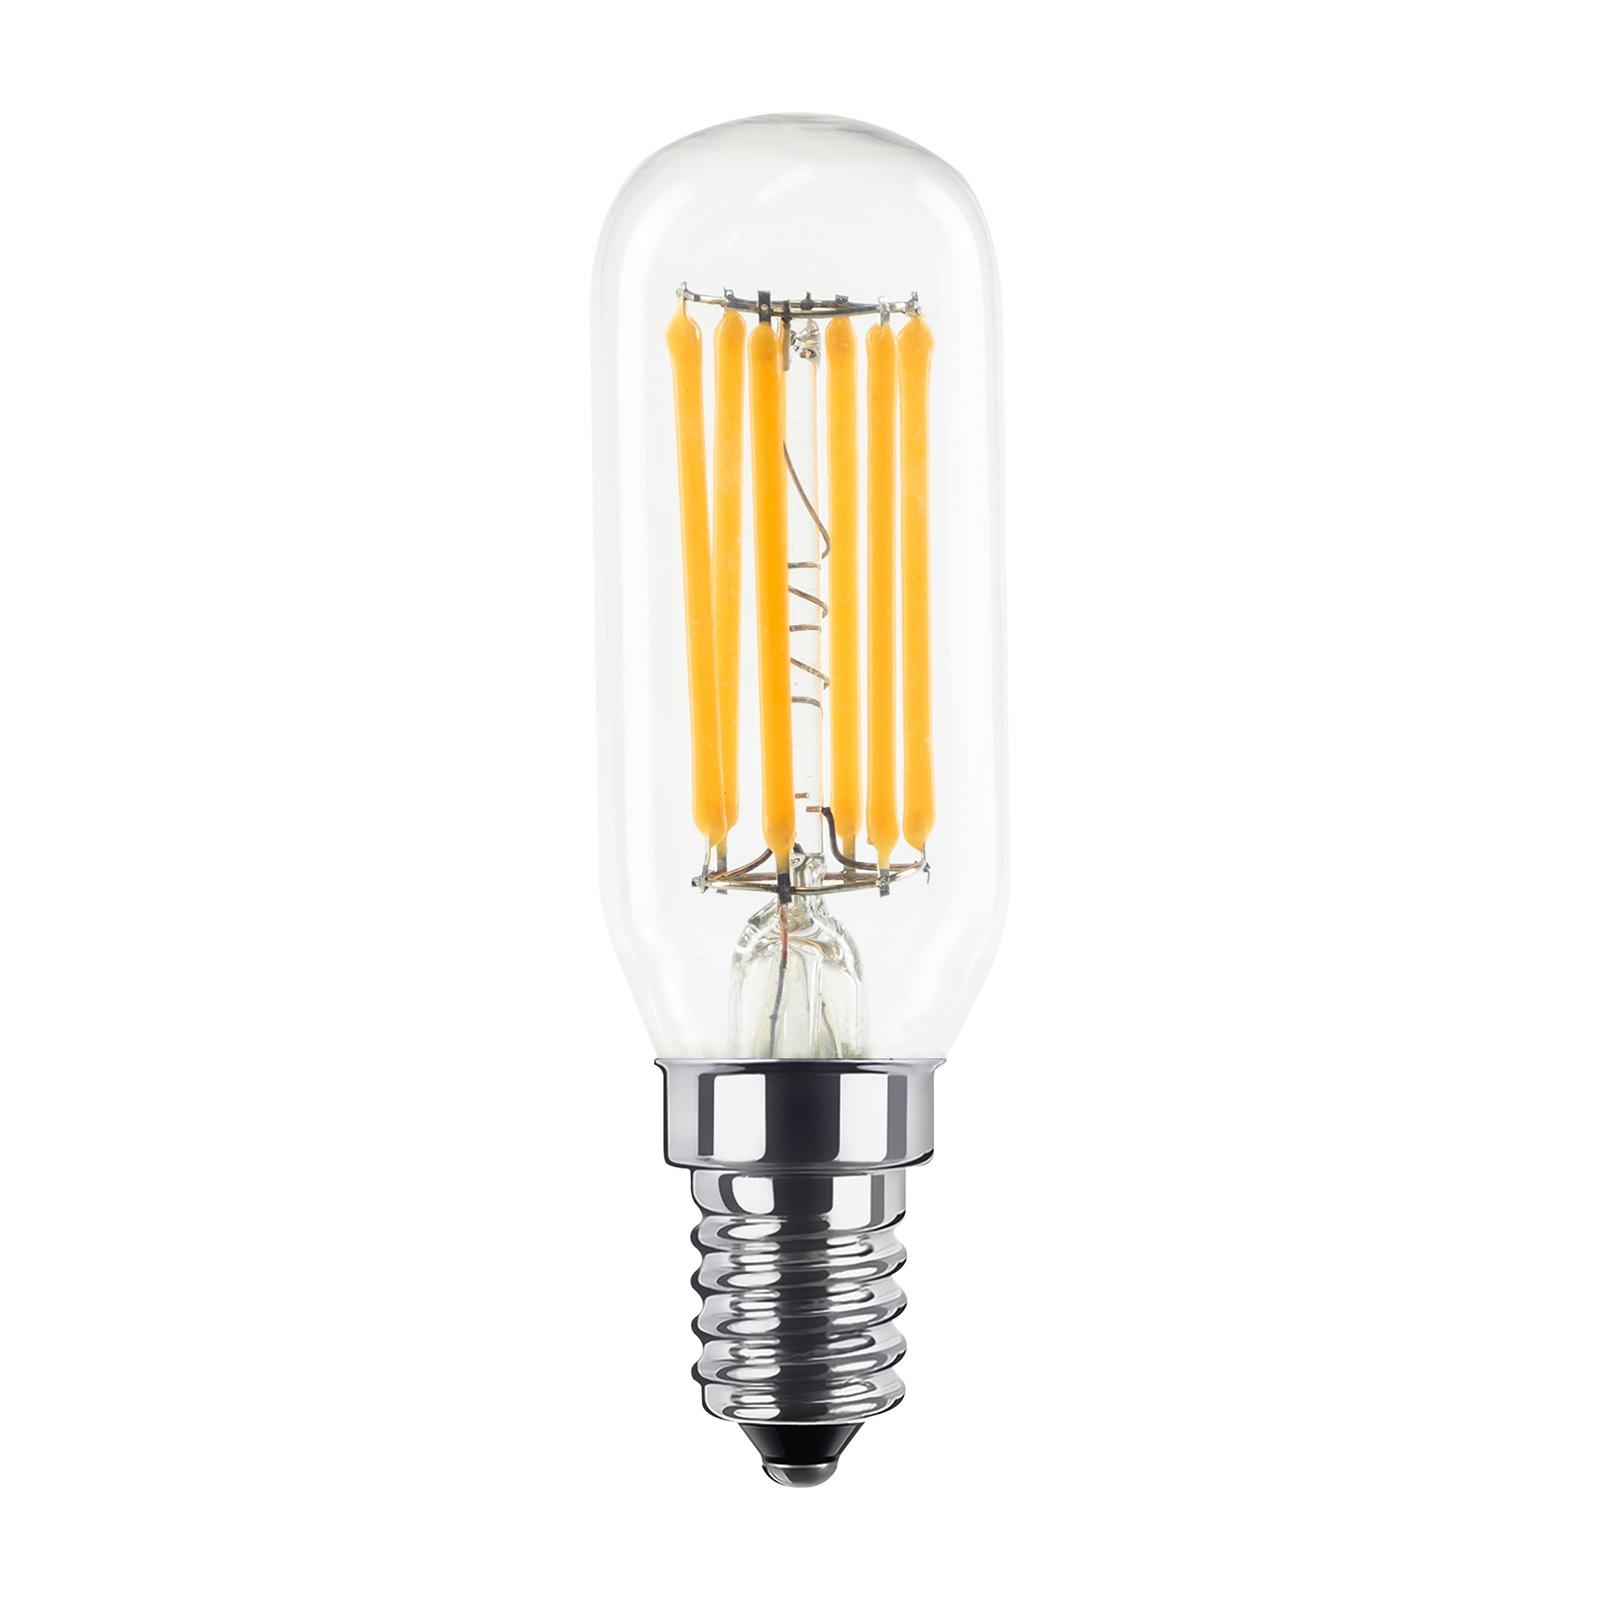 SEGULA LED-Mini Tube High Power, E14, 4,7W, 400lm